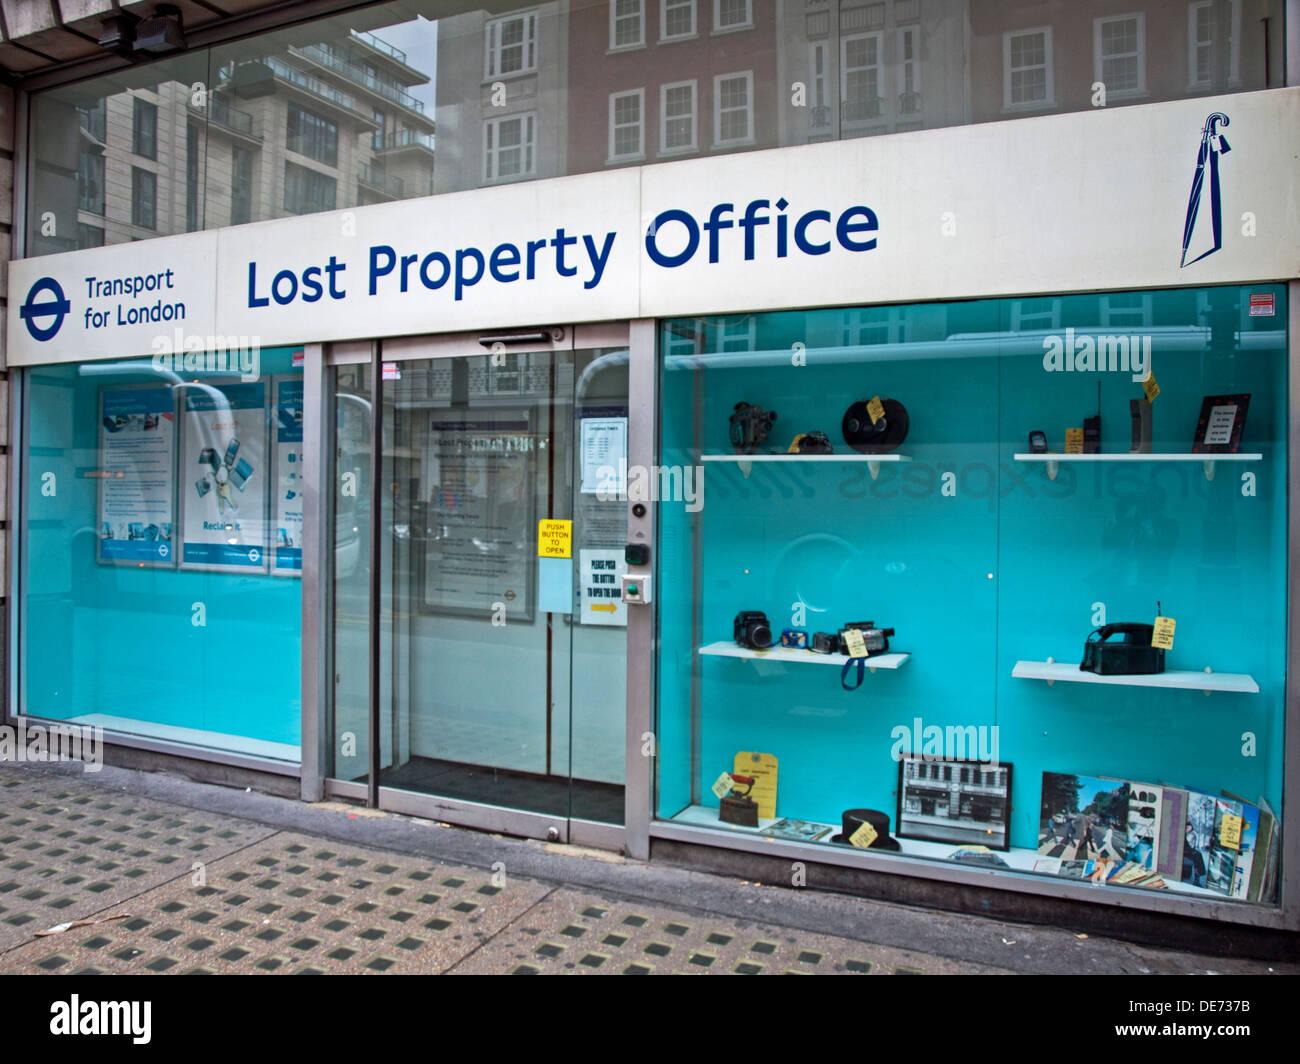 Transport for London Lost Property Office, Baker Street ...